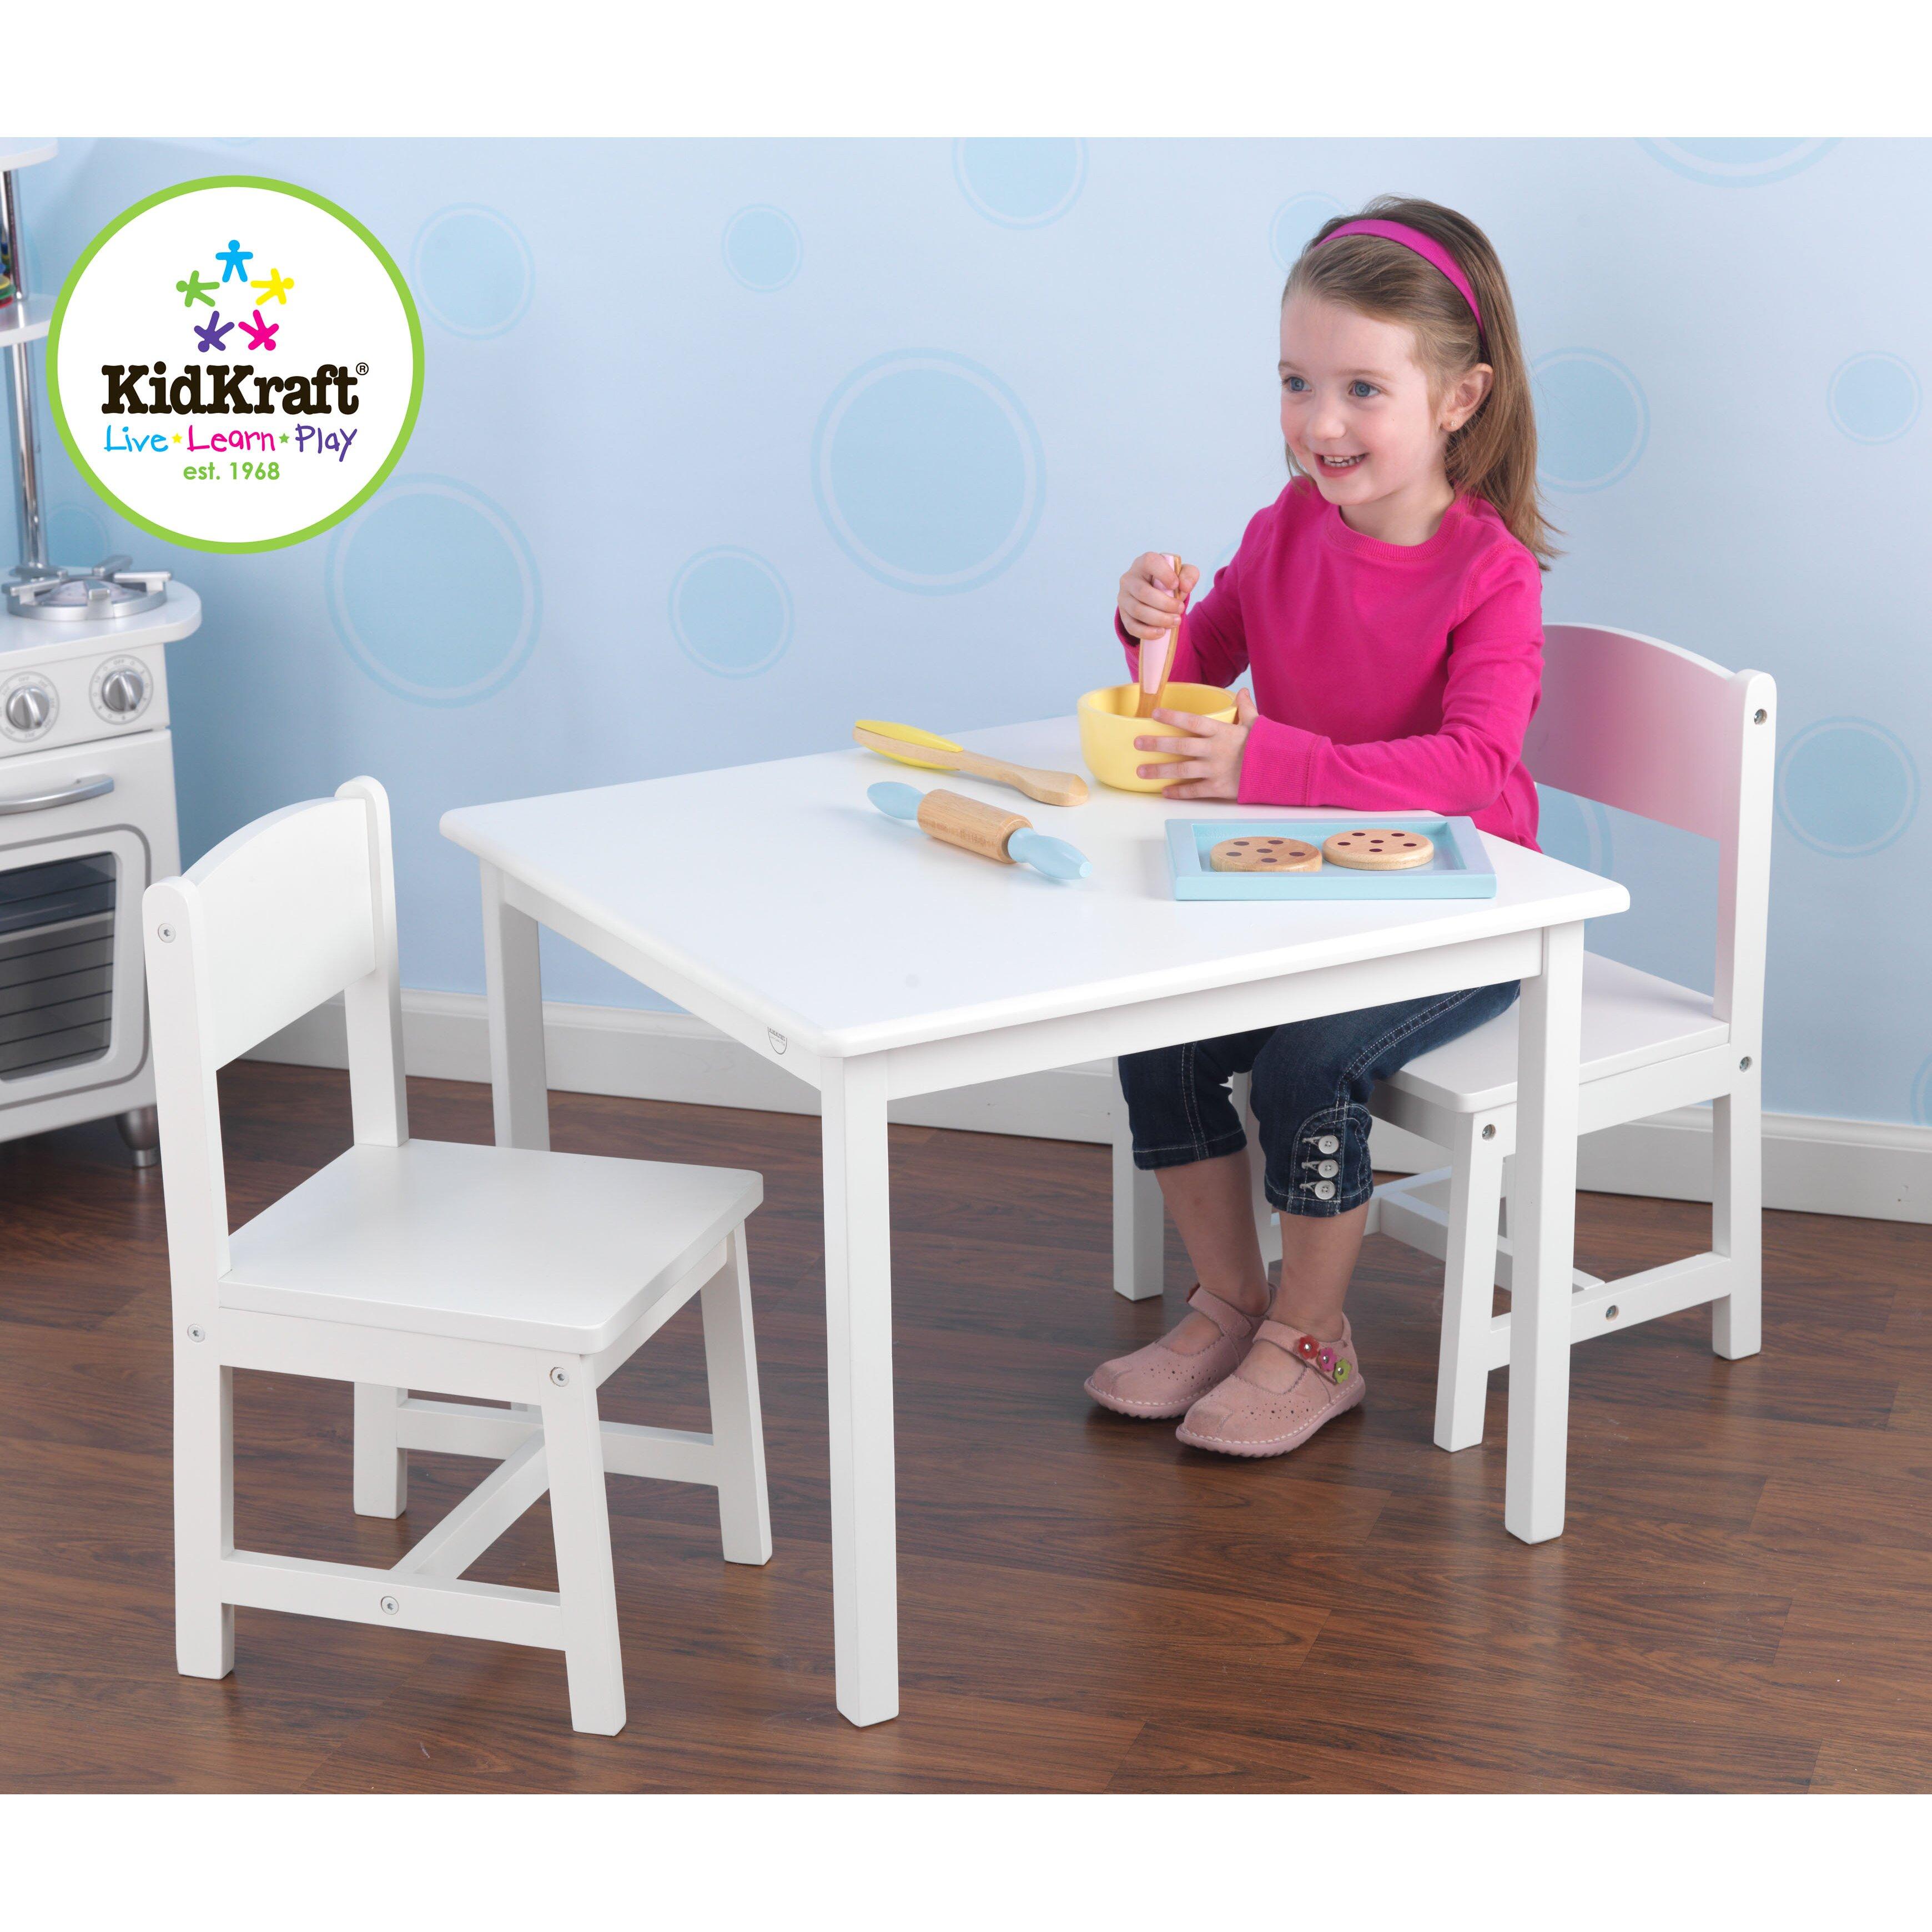 Kidkraft Heart Table And Chair Set Kidkraft Princess Vanity Table And Chair Set Pink Purple Globorank